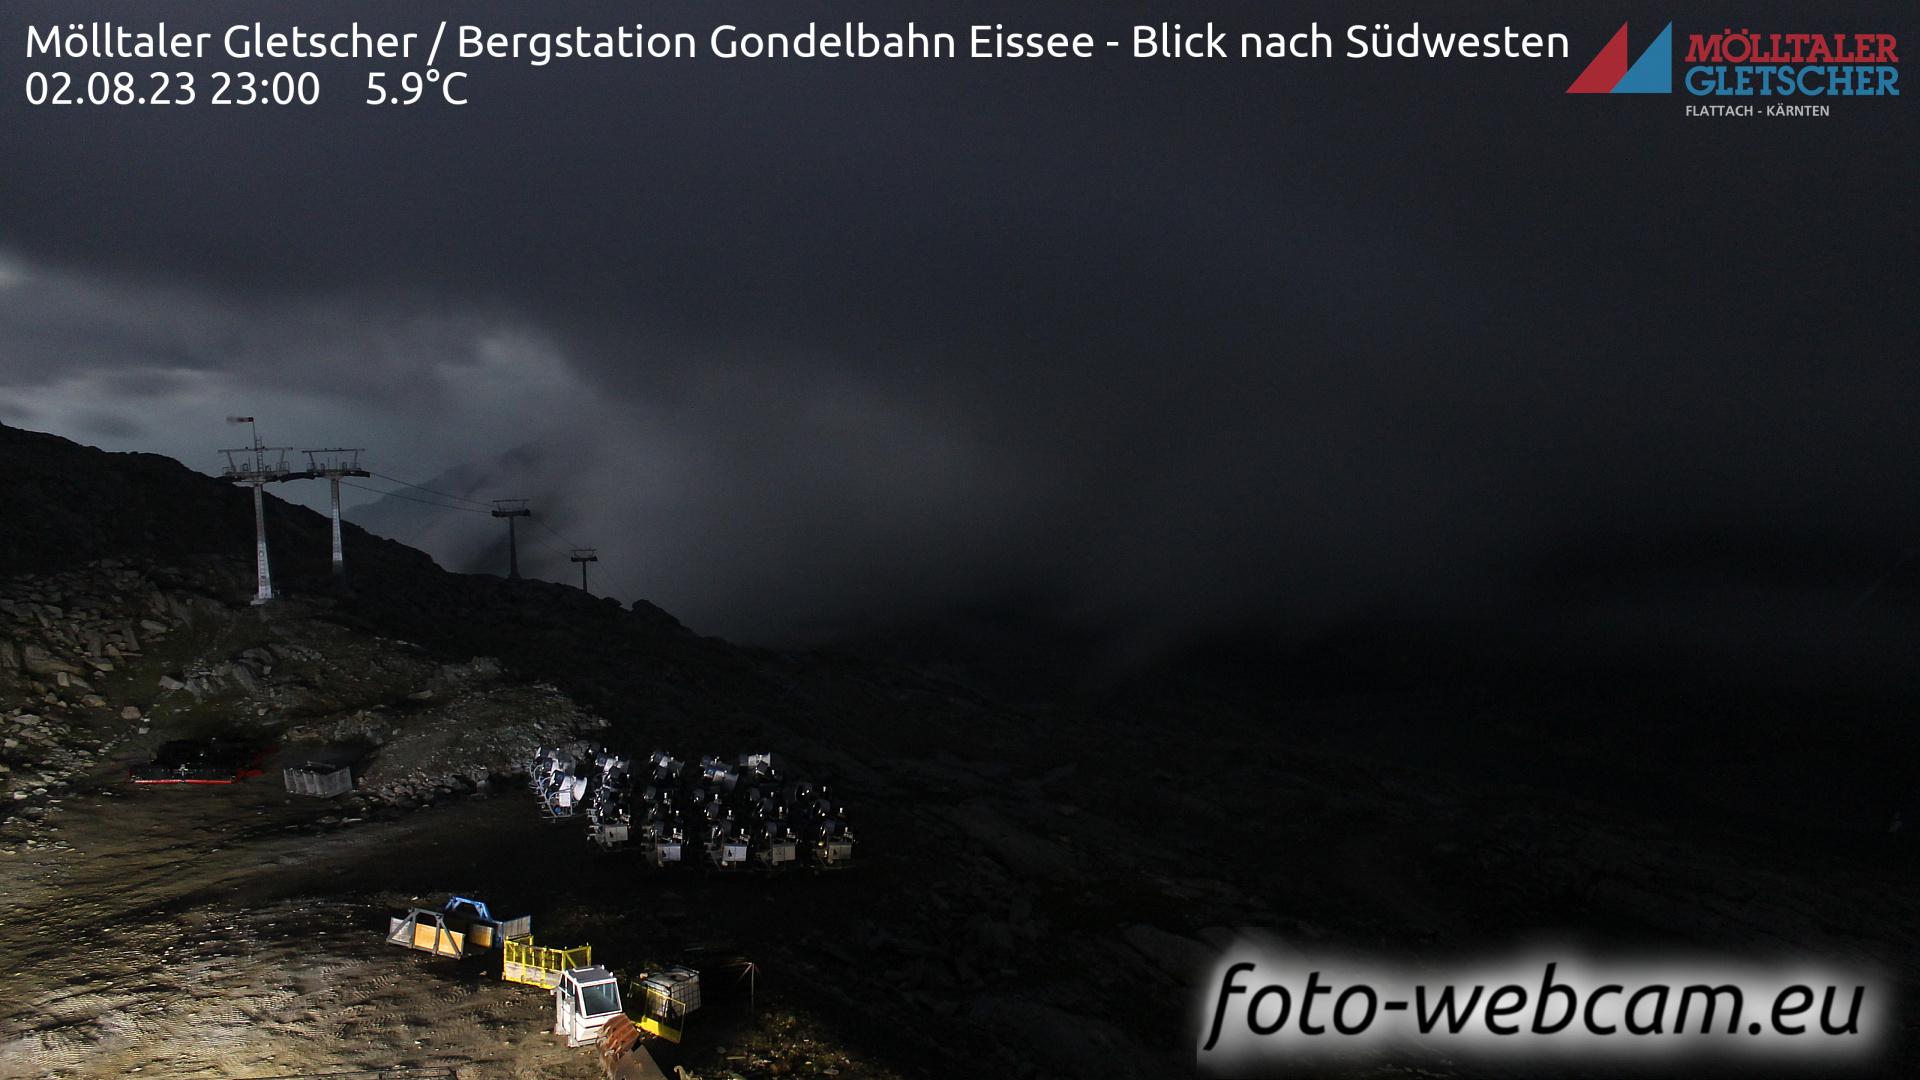 Glacier Mölltal Mon. 23:29